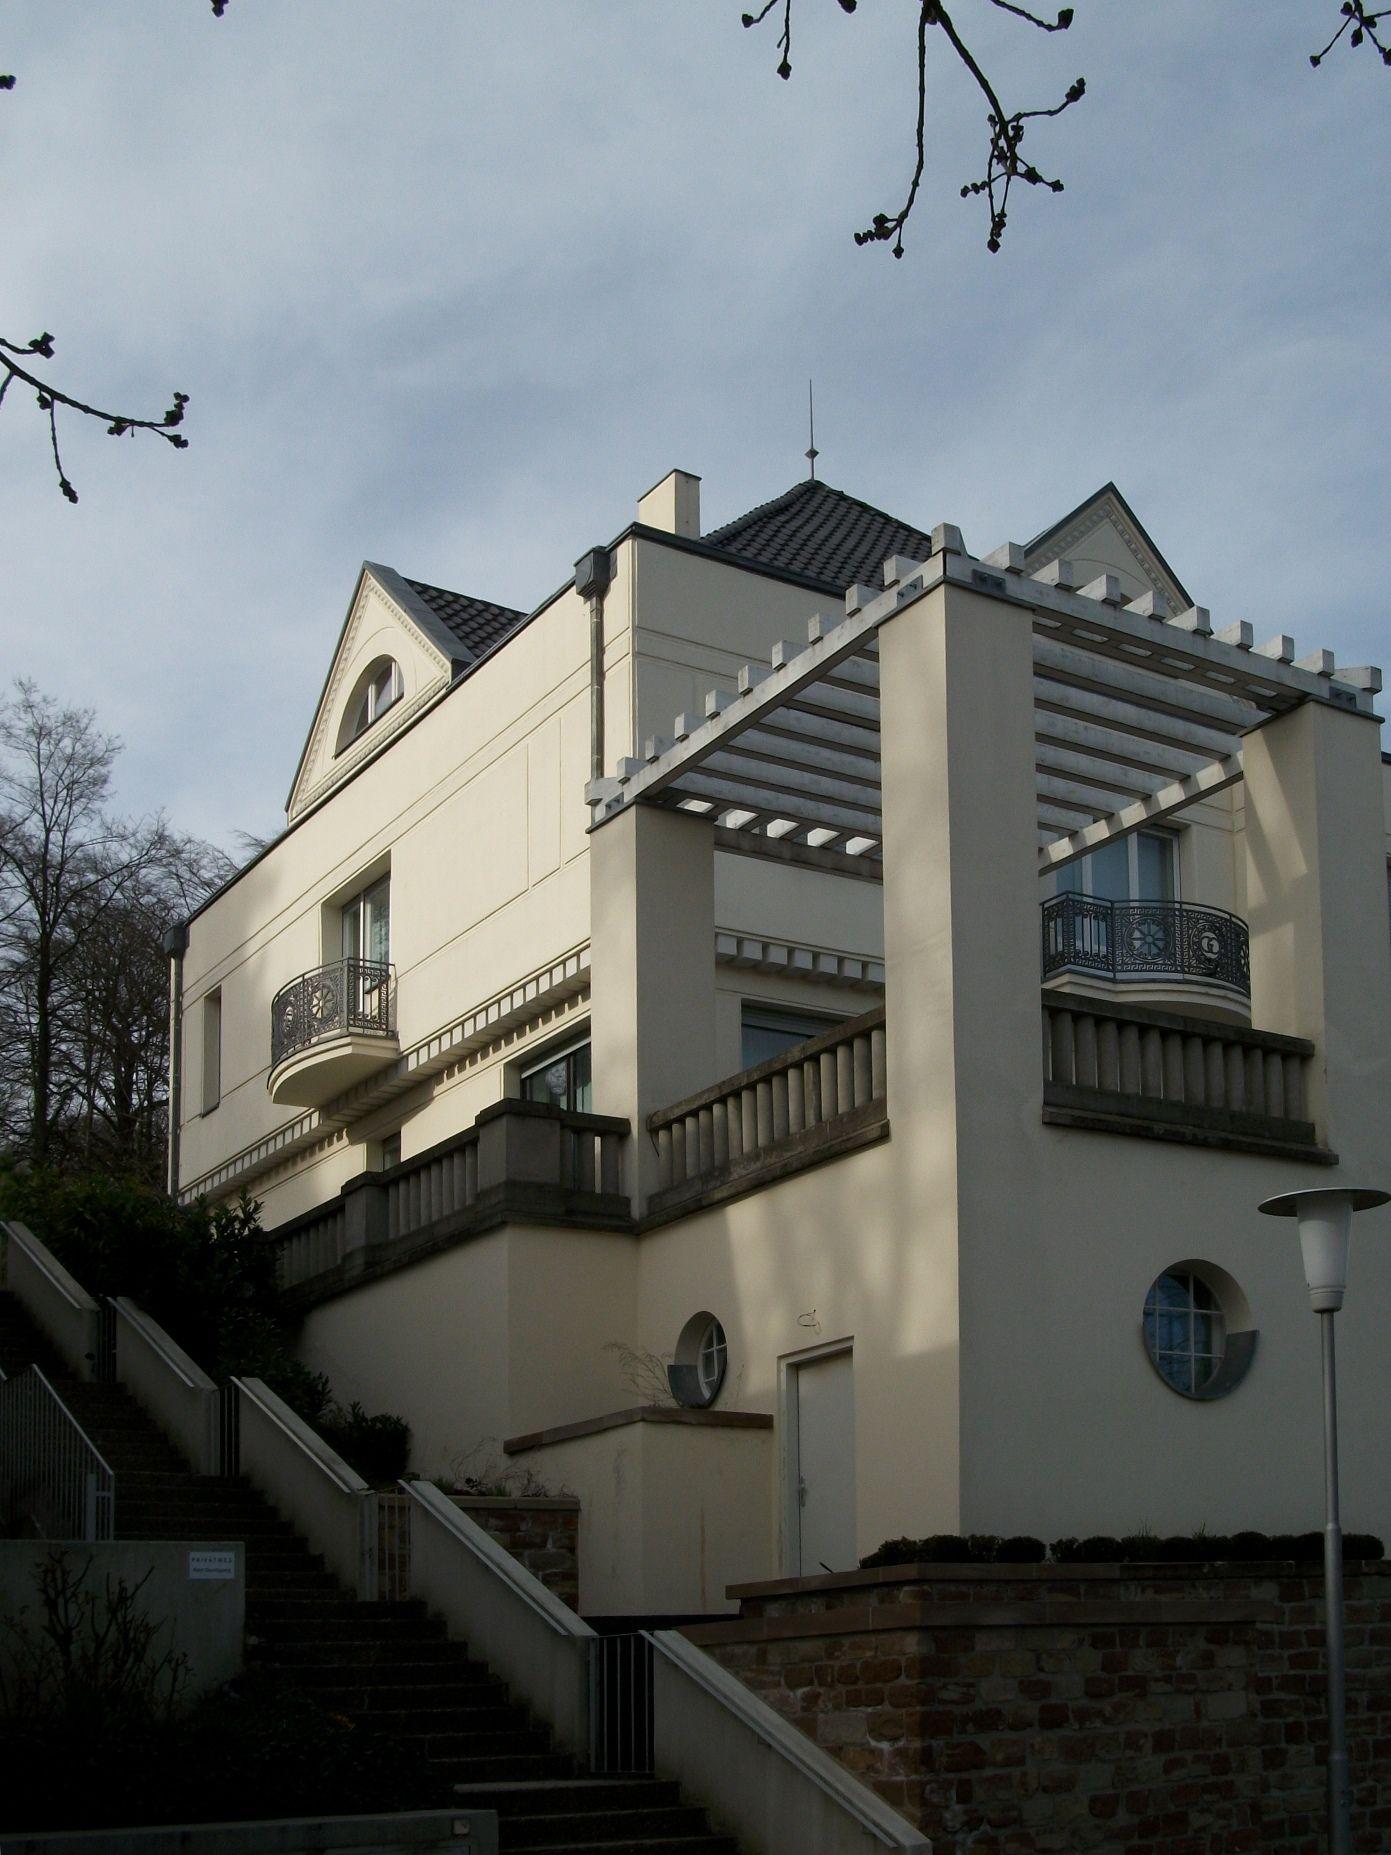 Peter behrens villa obenauer saarbr cken 2 peter for Behrens house